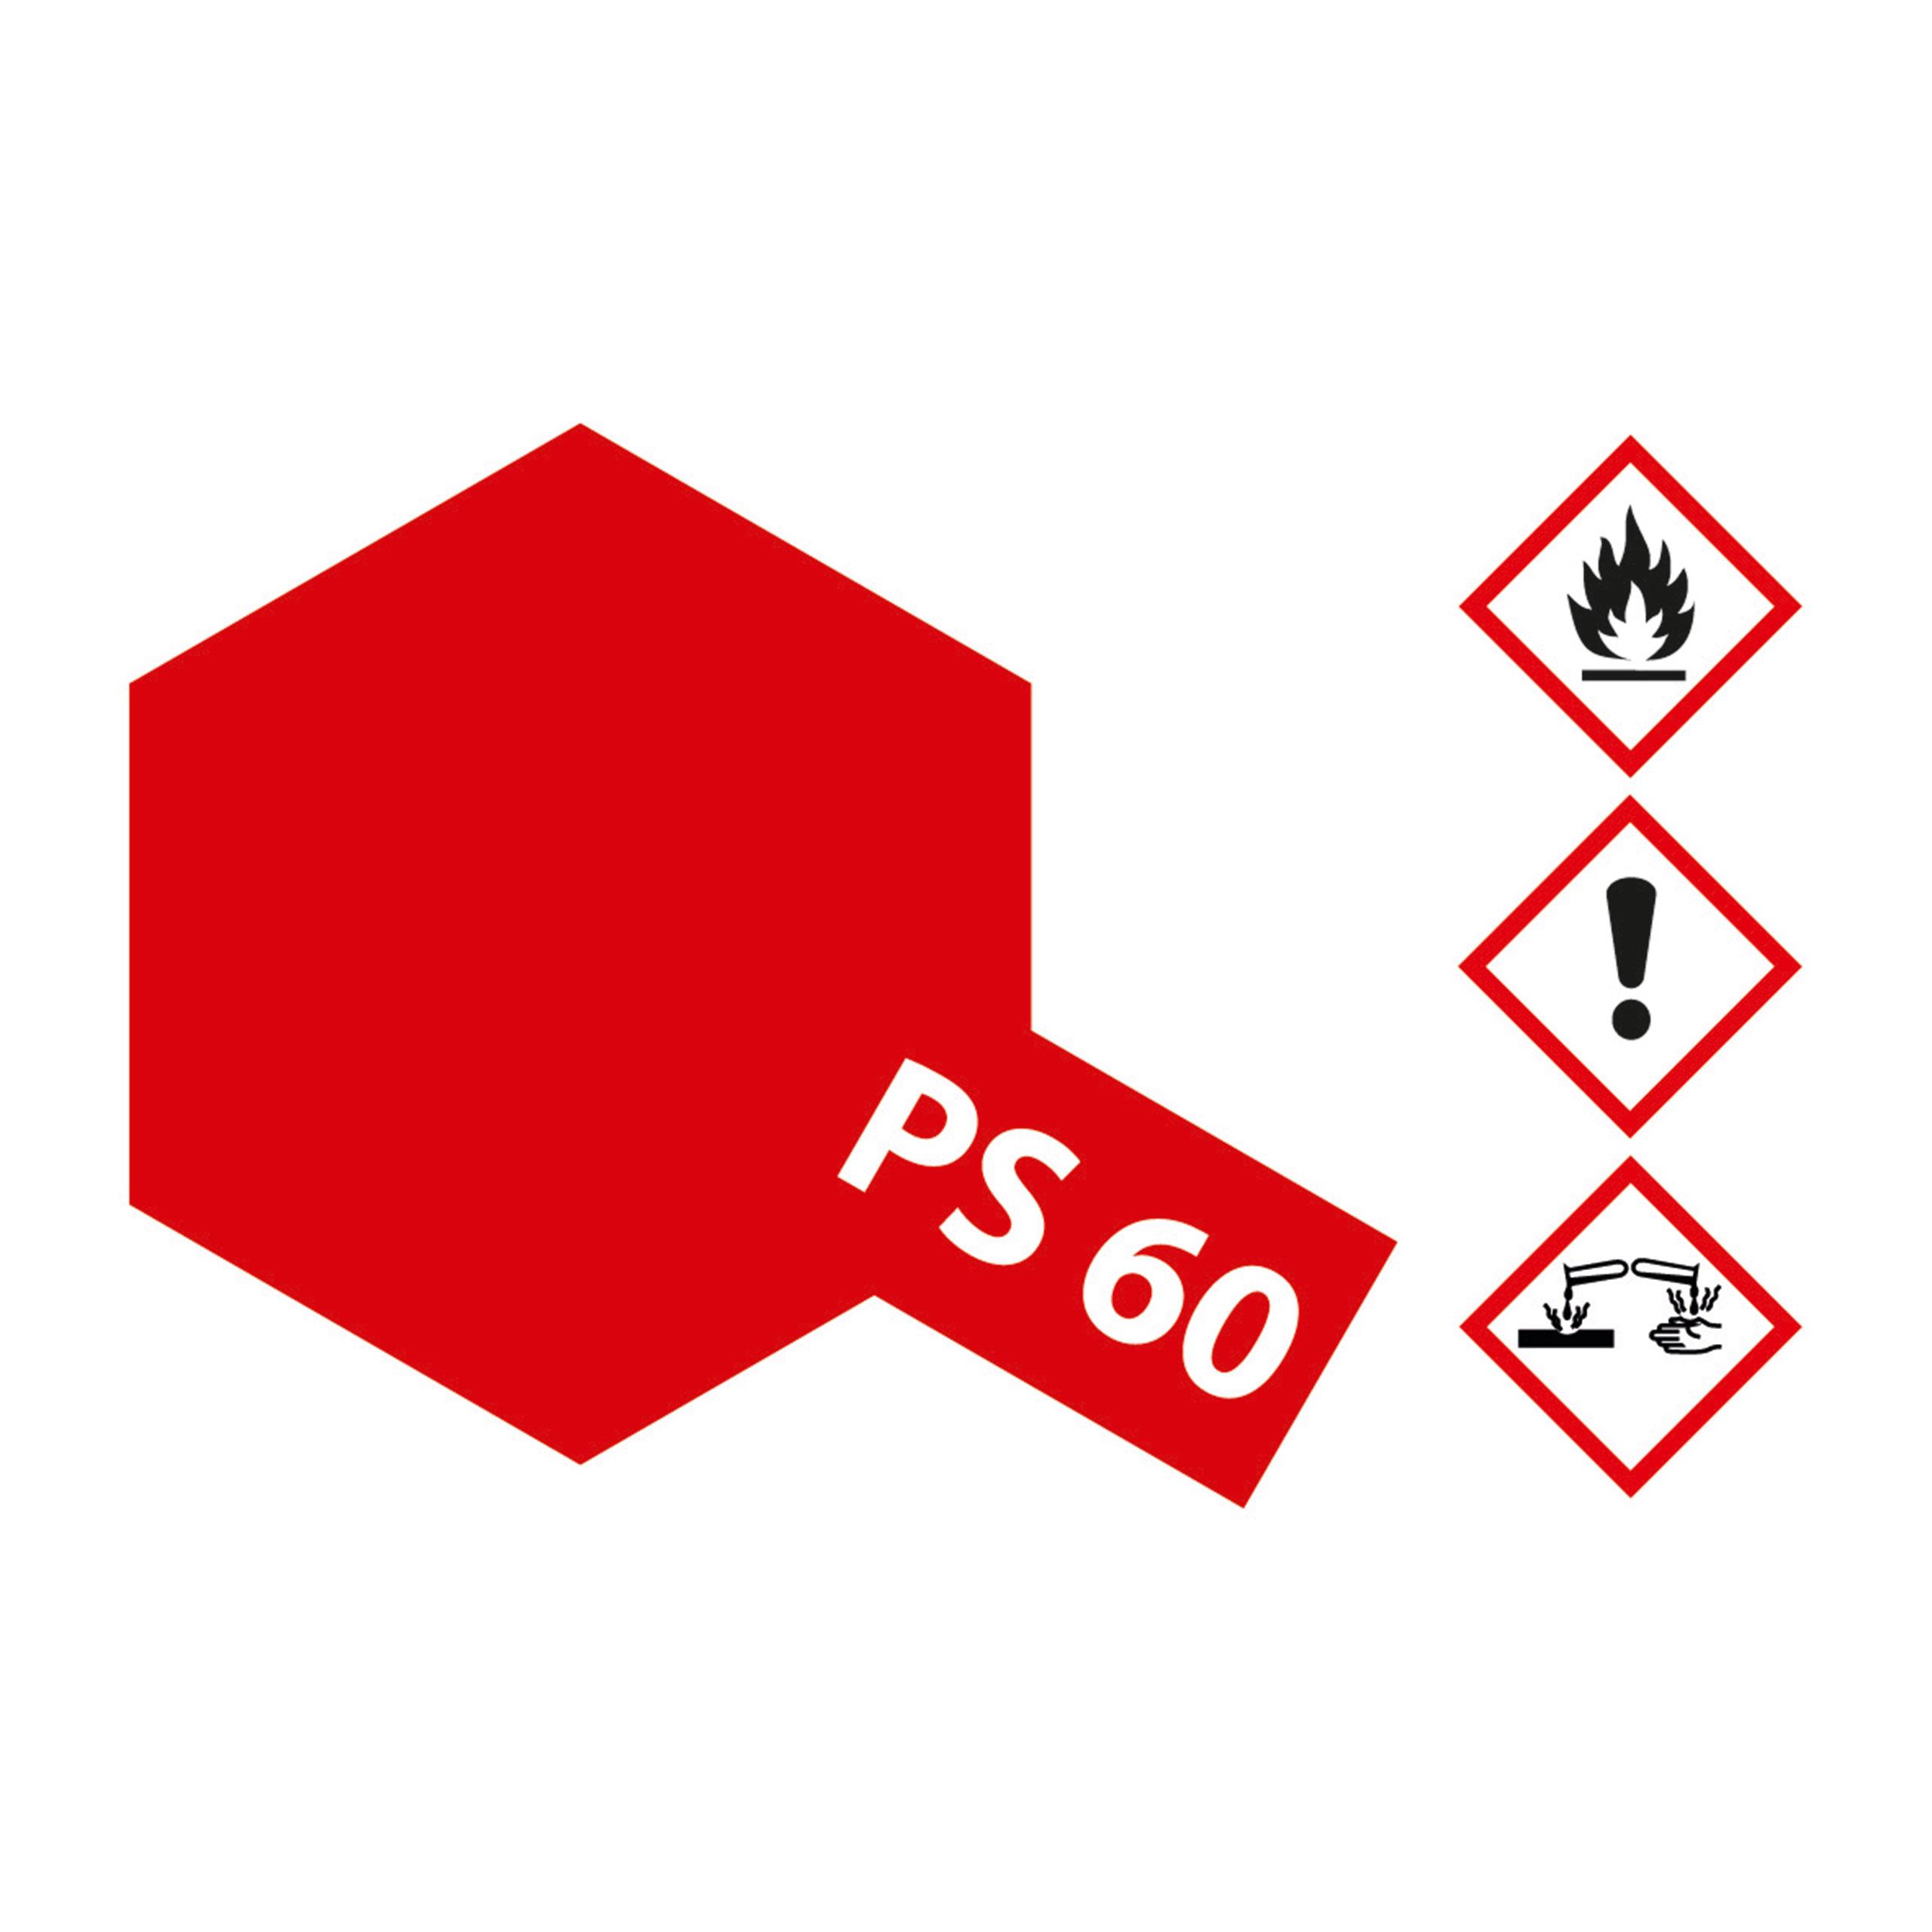 PS-60 Hell Mica Rot (Glimmer) Pc. - 100ml Sprayfarbe Lexan - Tamiya 300086060